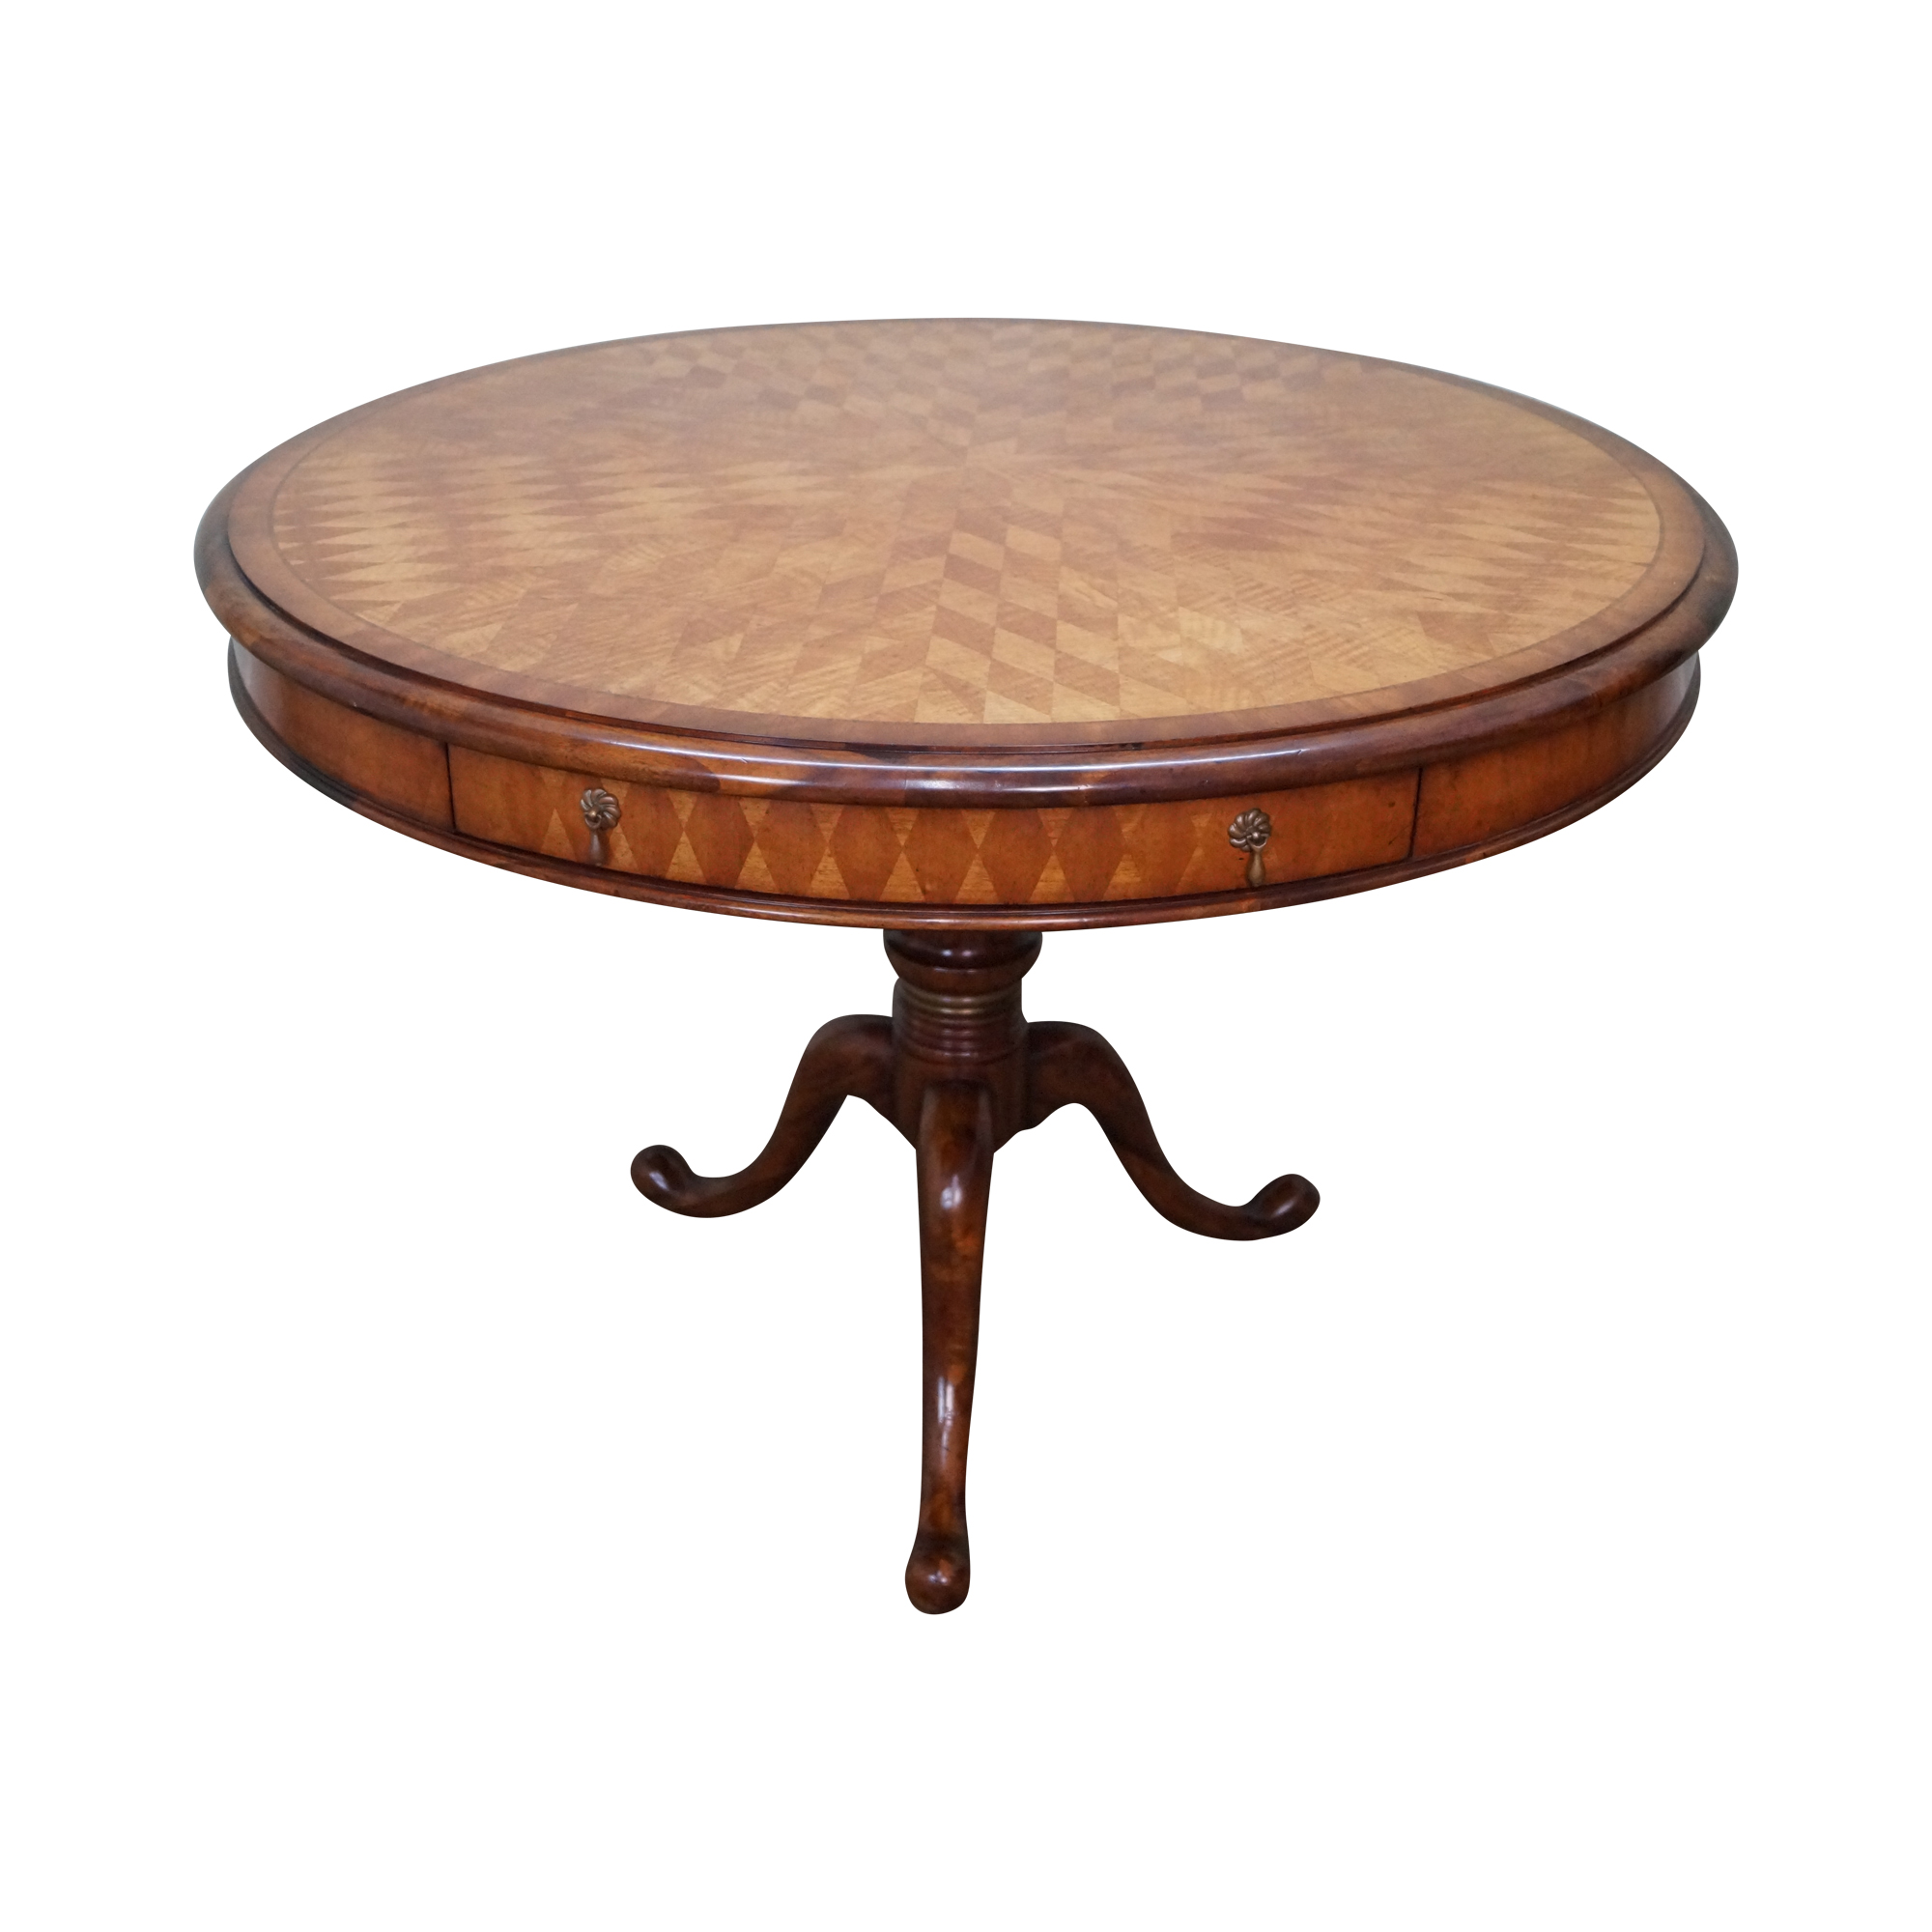 Jonathan Charles Herringbone Parquet Inlaid Table